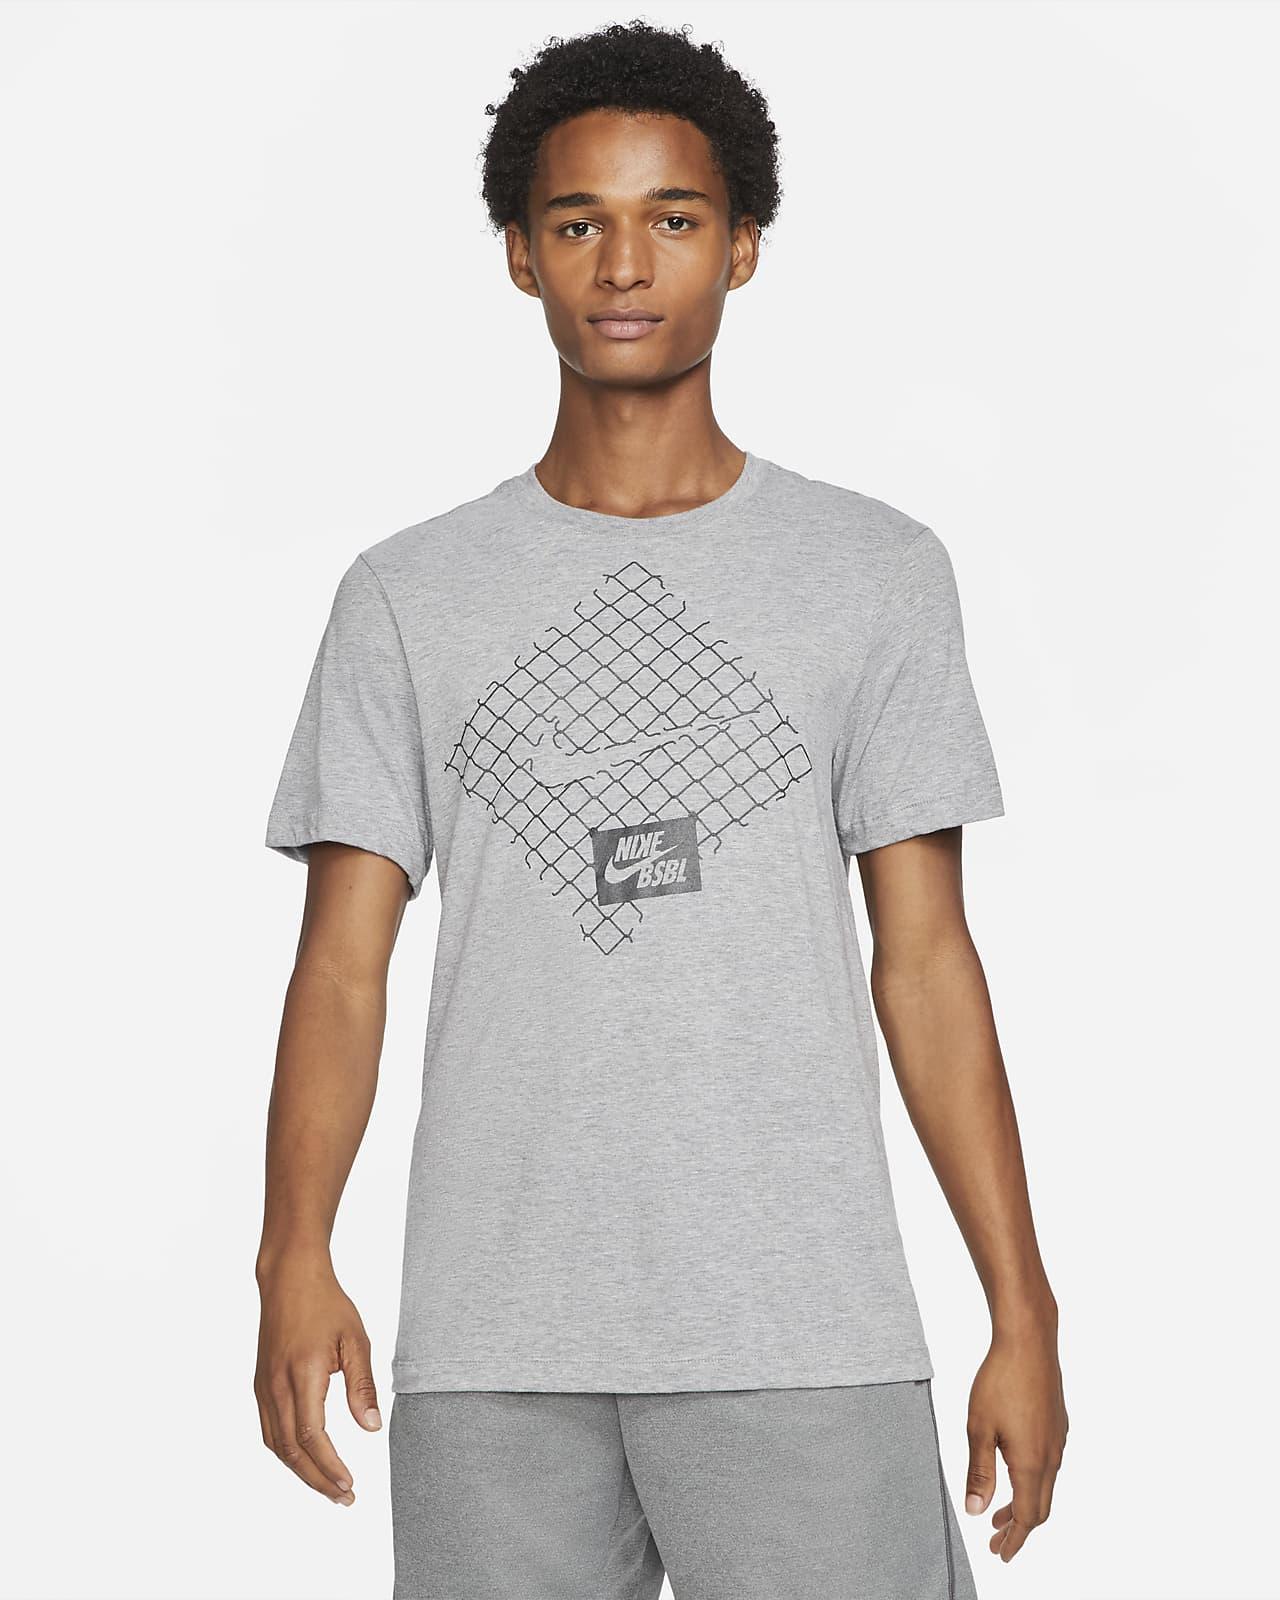 Nike Men's Baseball T-Shirt